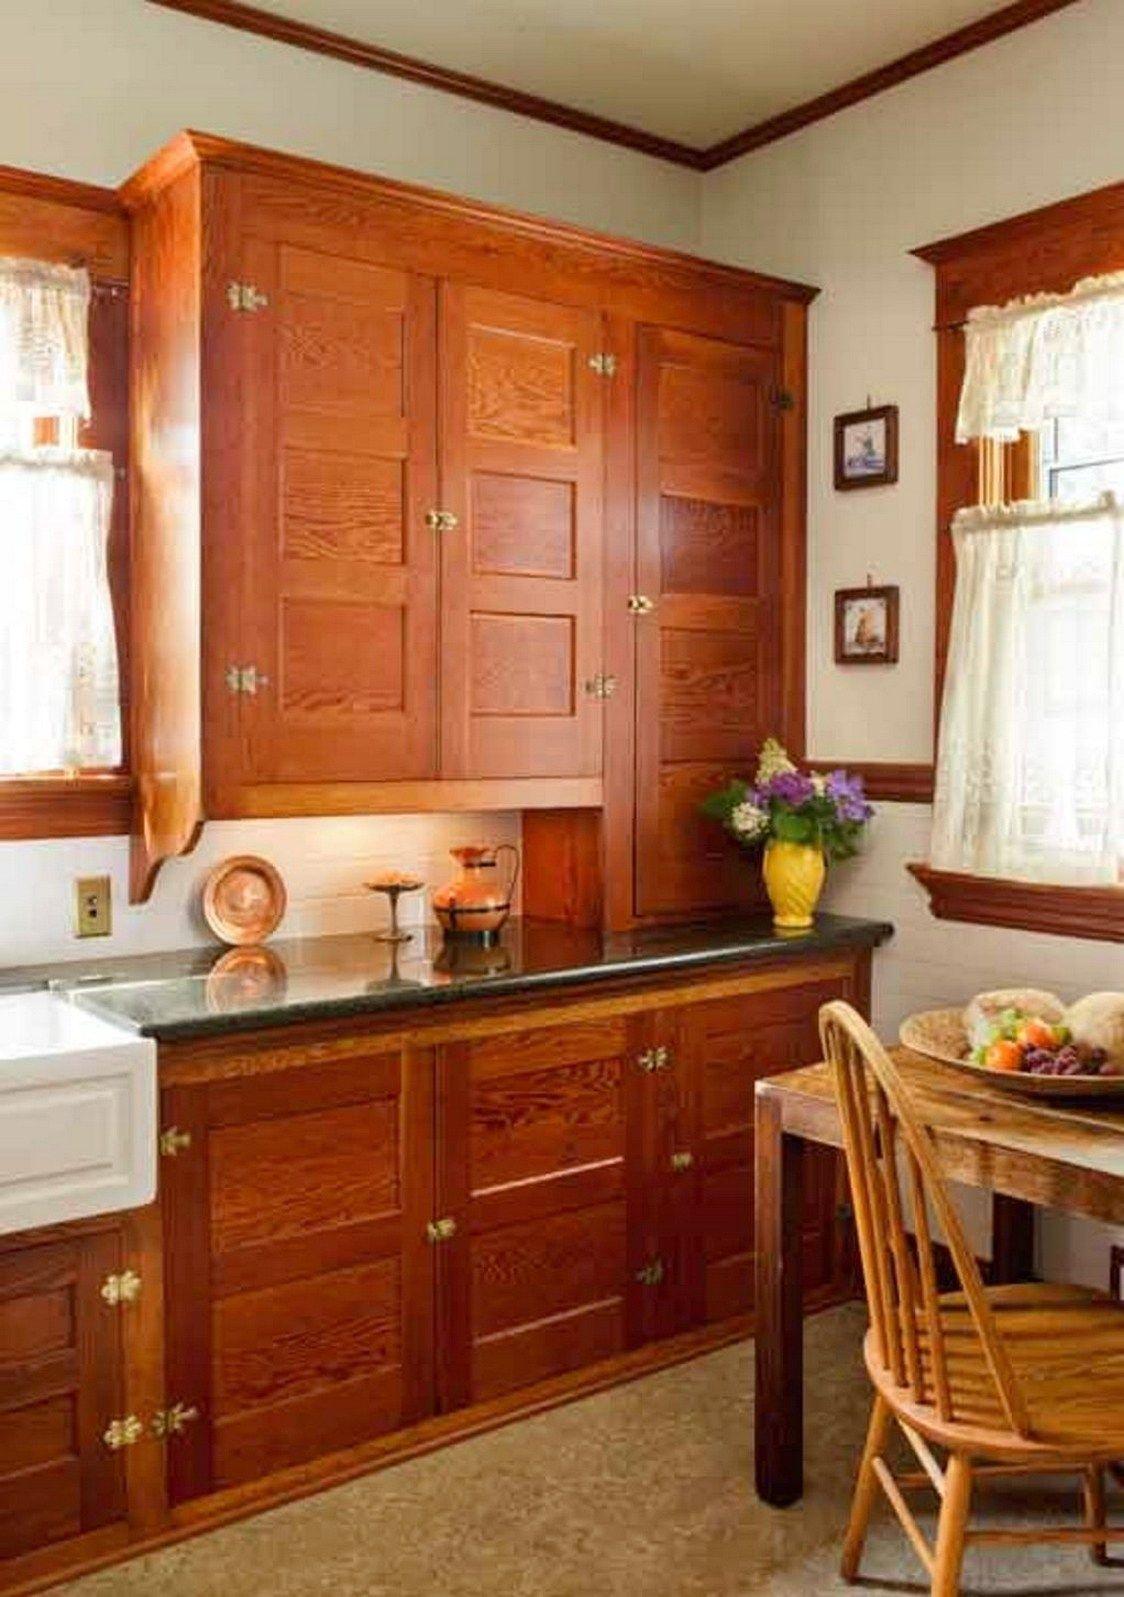 101 awesome craftsman kitchen design ideas (73)   Bungalow ...